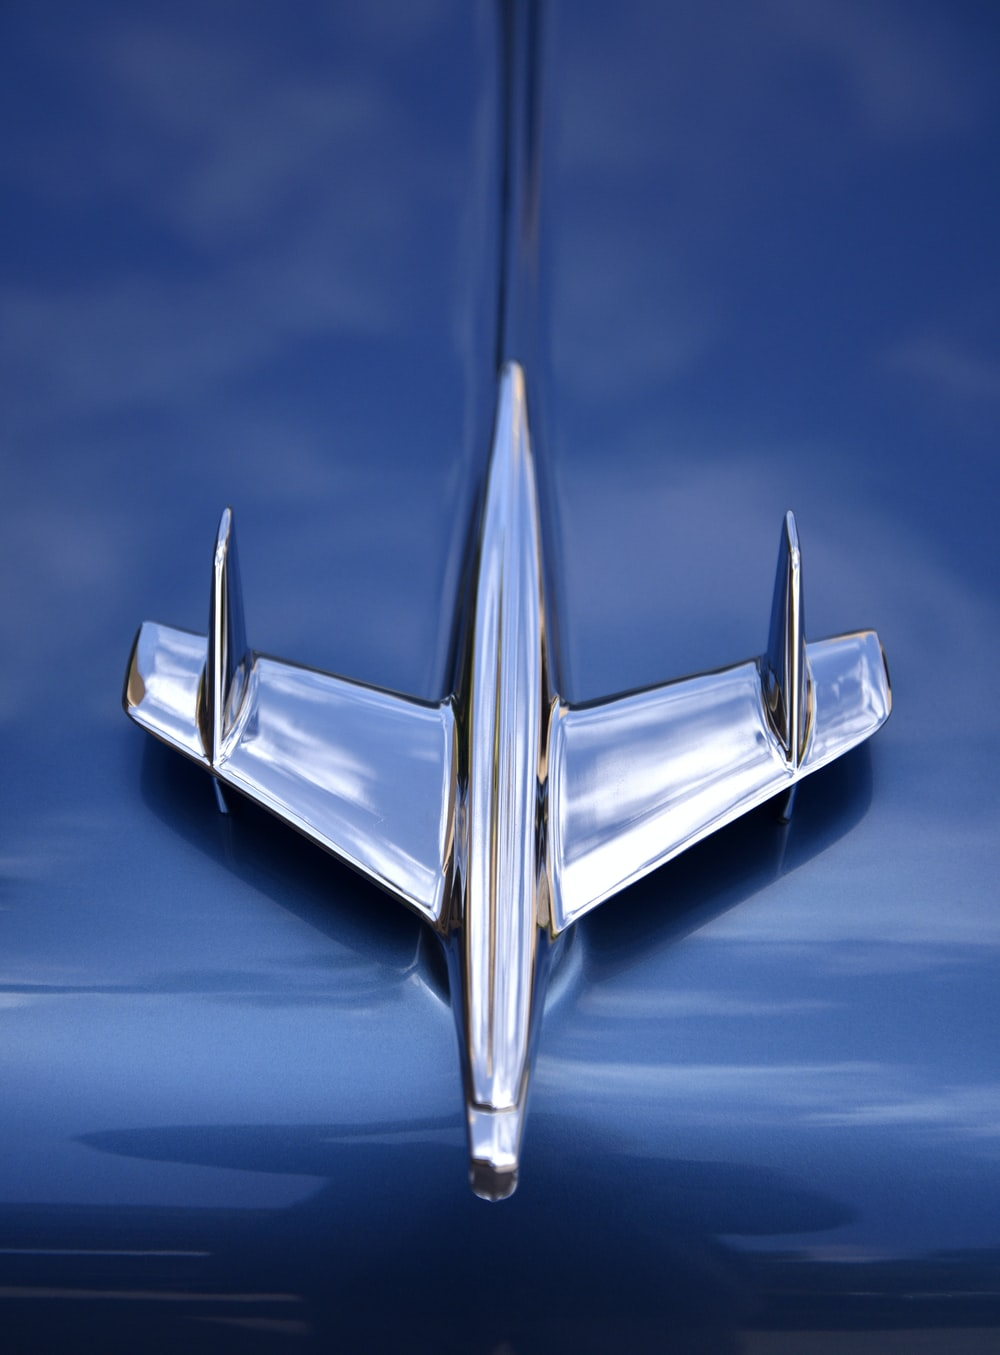 silver car plane emblem